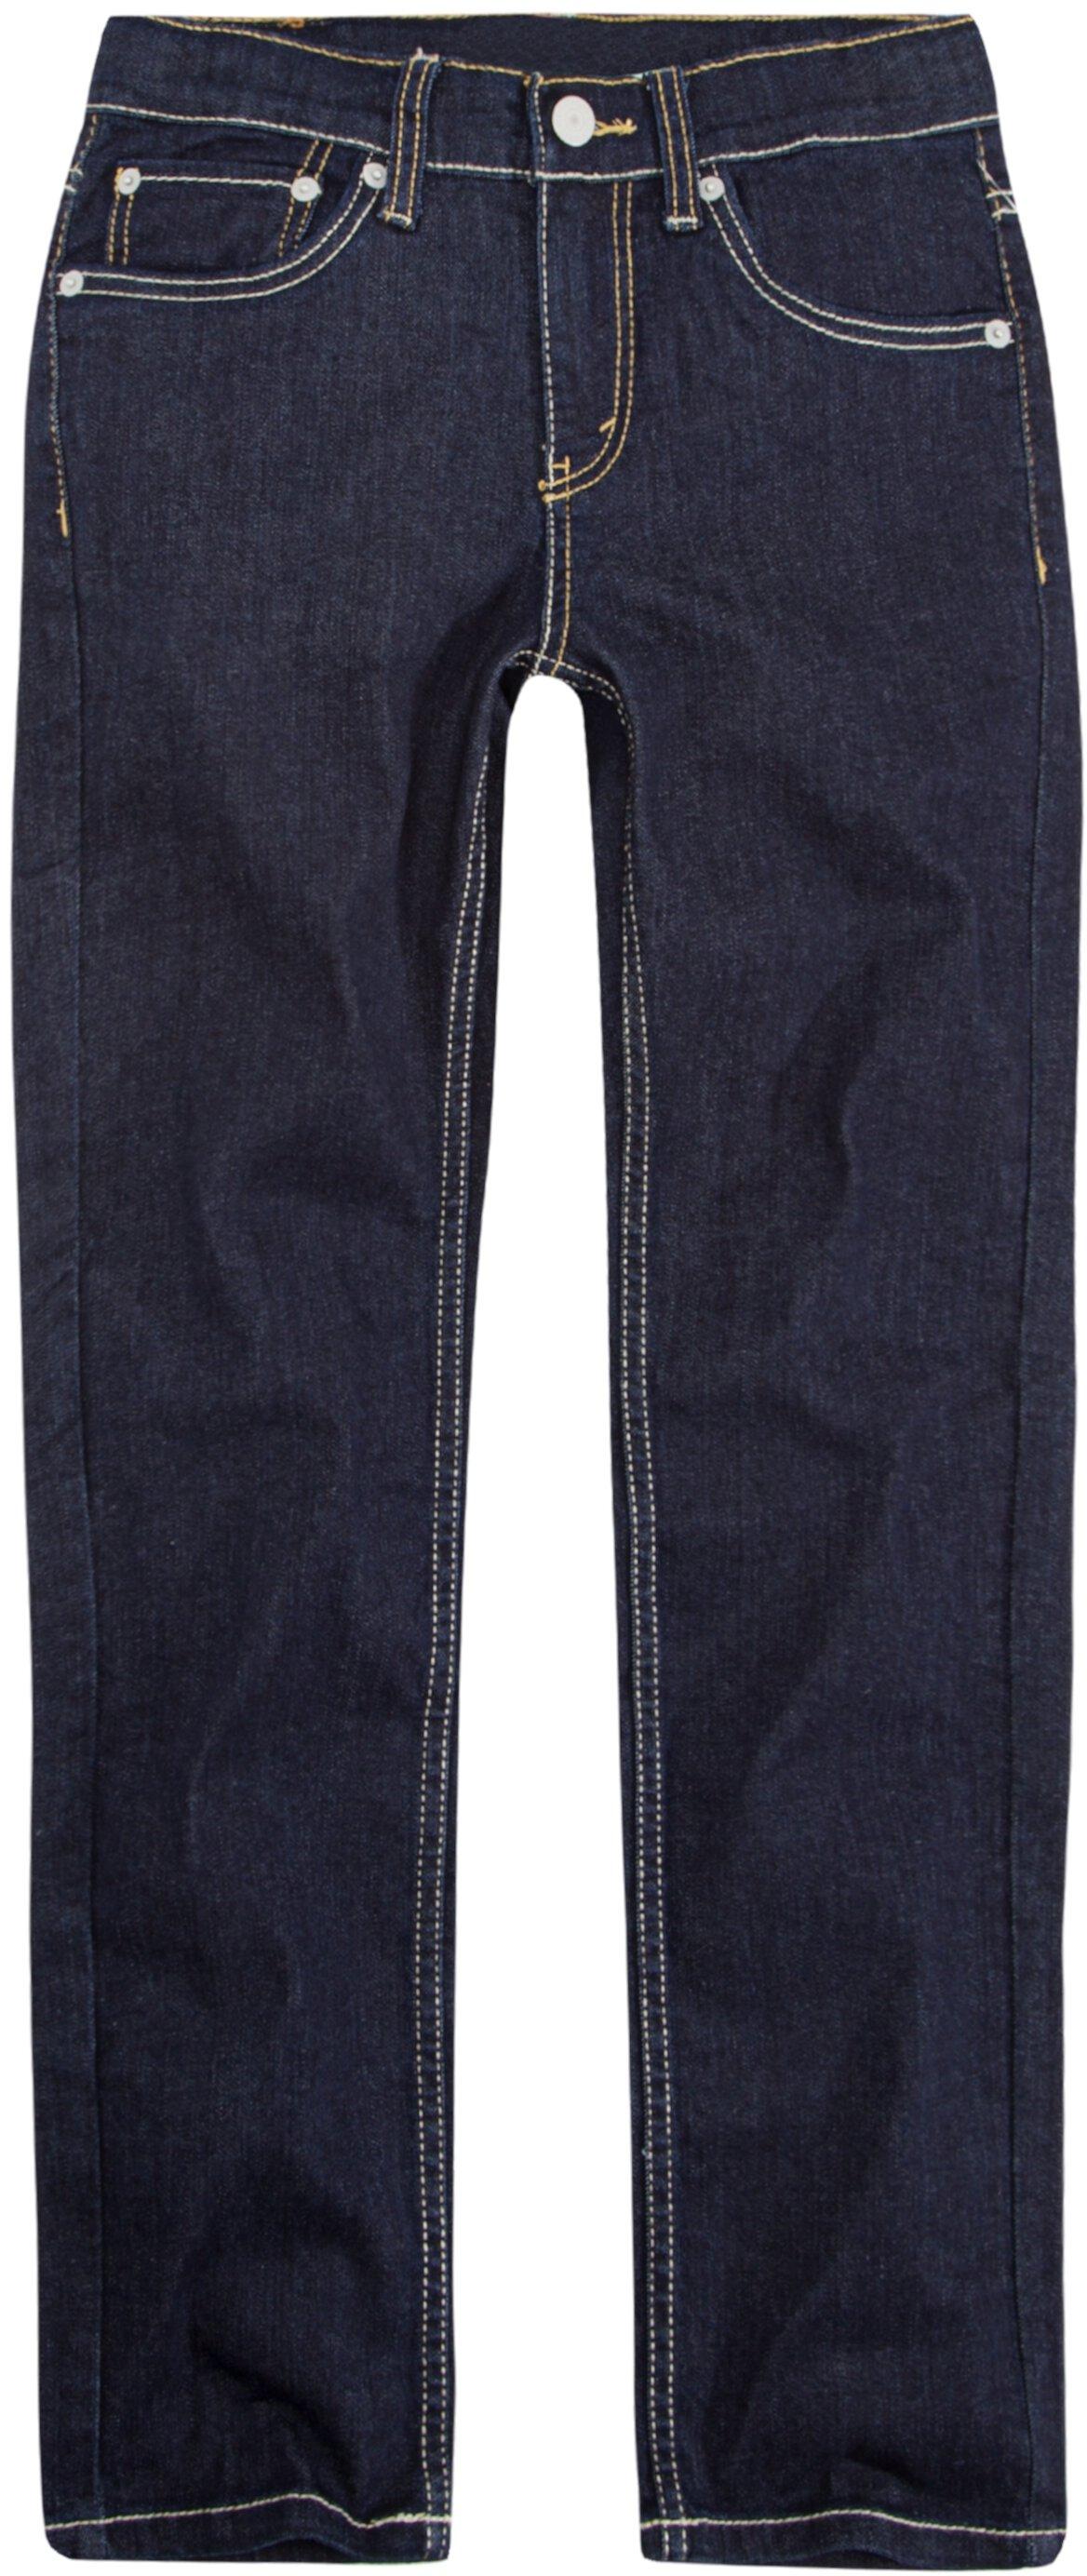 512 Slim Fit Taper Jeans (Маленькие дети) Levi's®